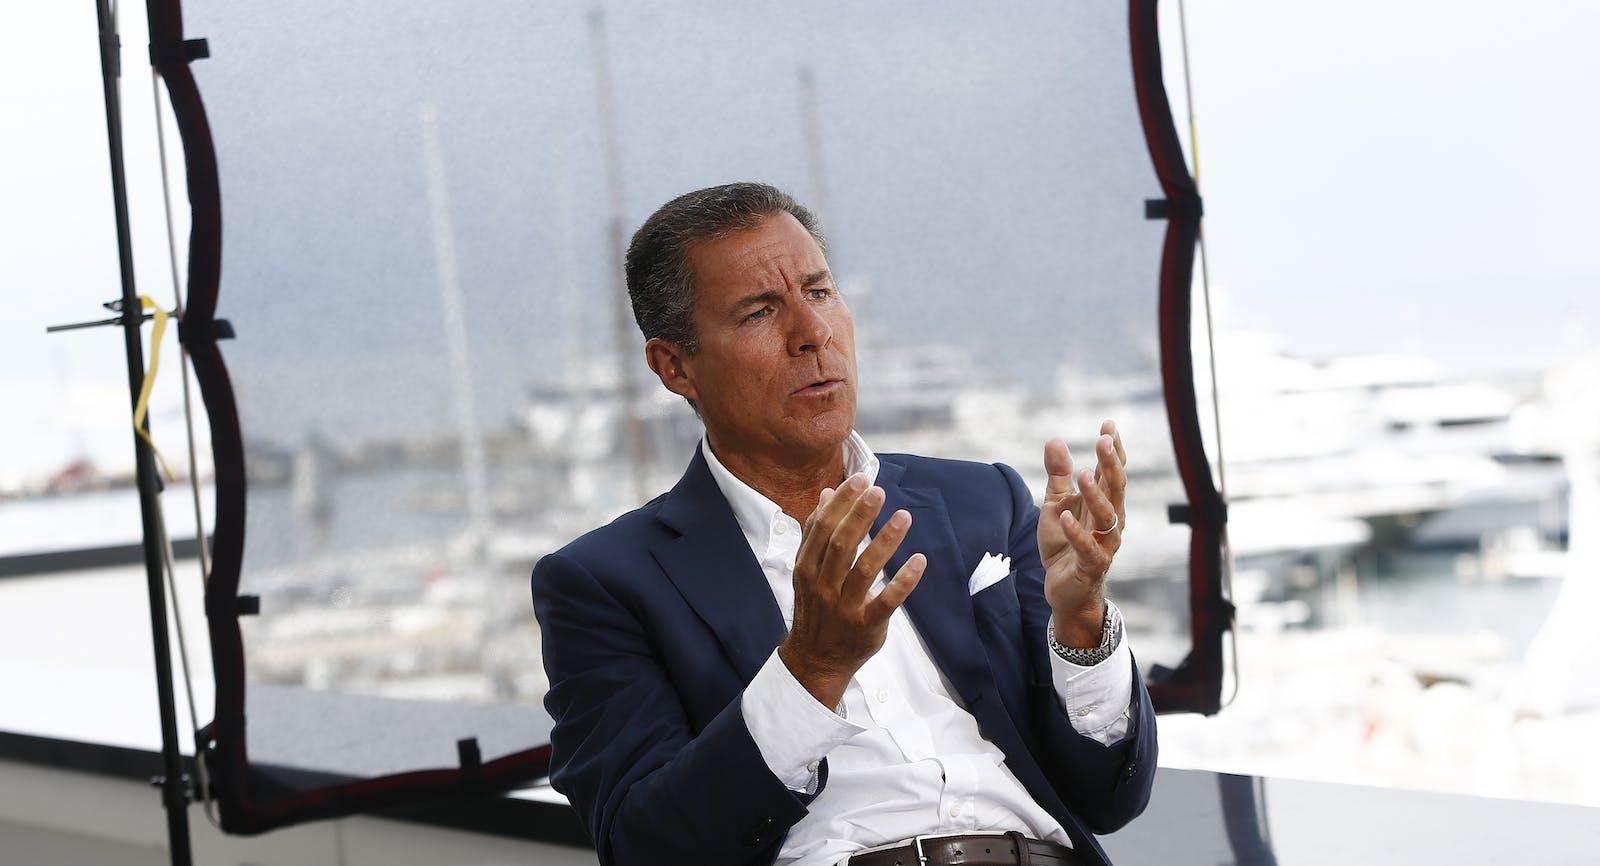 HBO CEO Richard Plepler. Photo by Bloomberg.